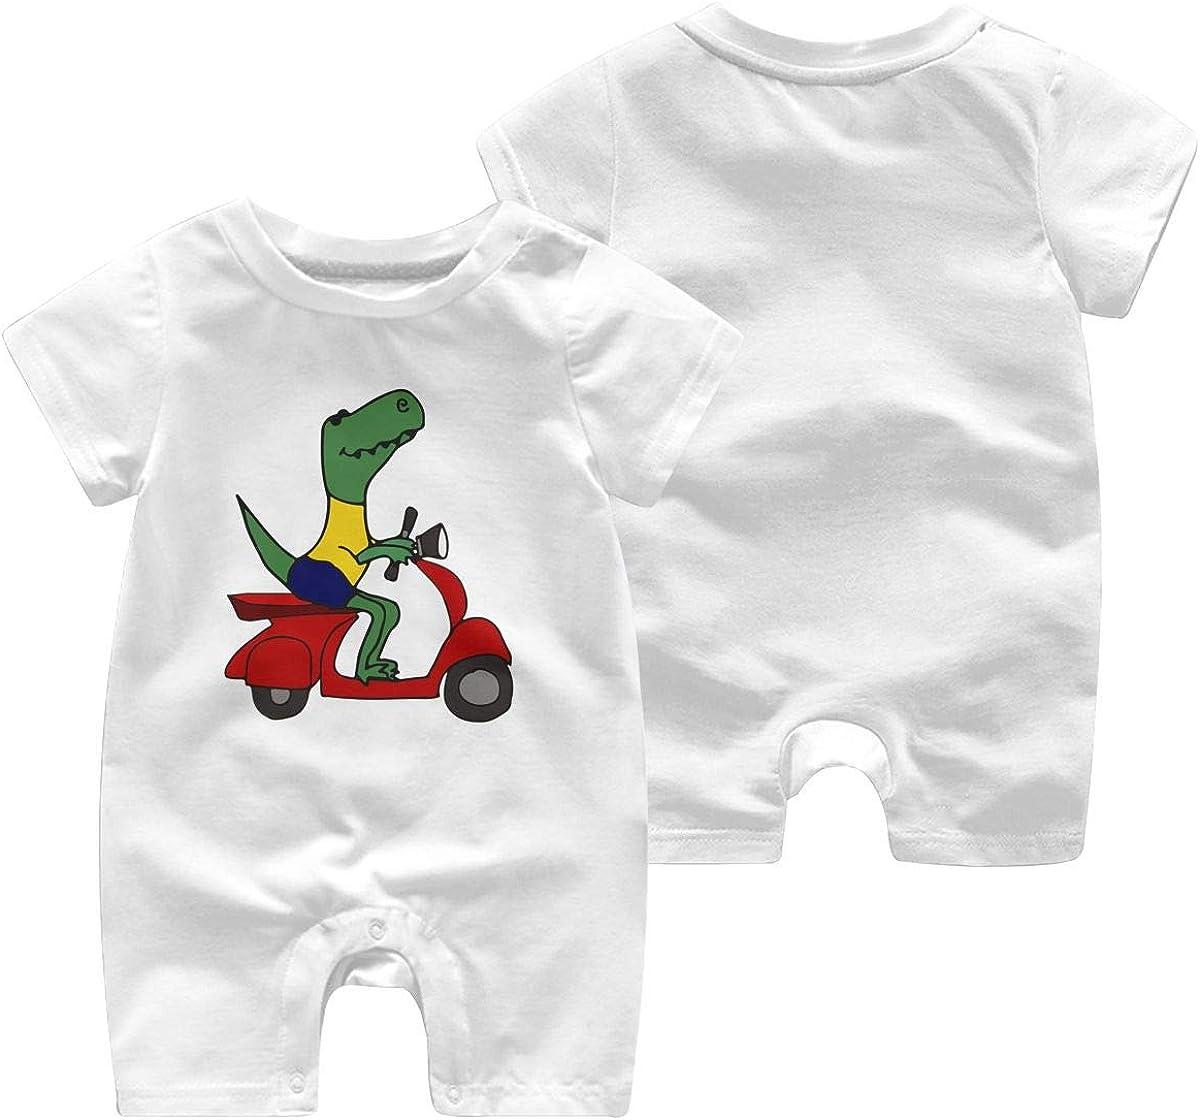 Toddler Baby Boy Girl Jumpsuit T-Rex Dinosaur Riding Motor Scooter Toddler Jumpsuit